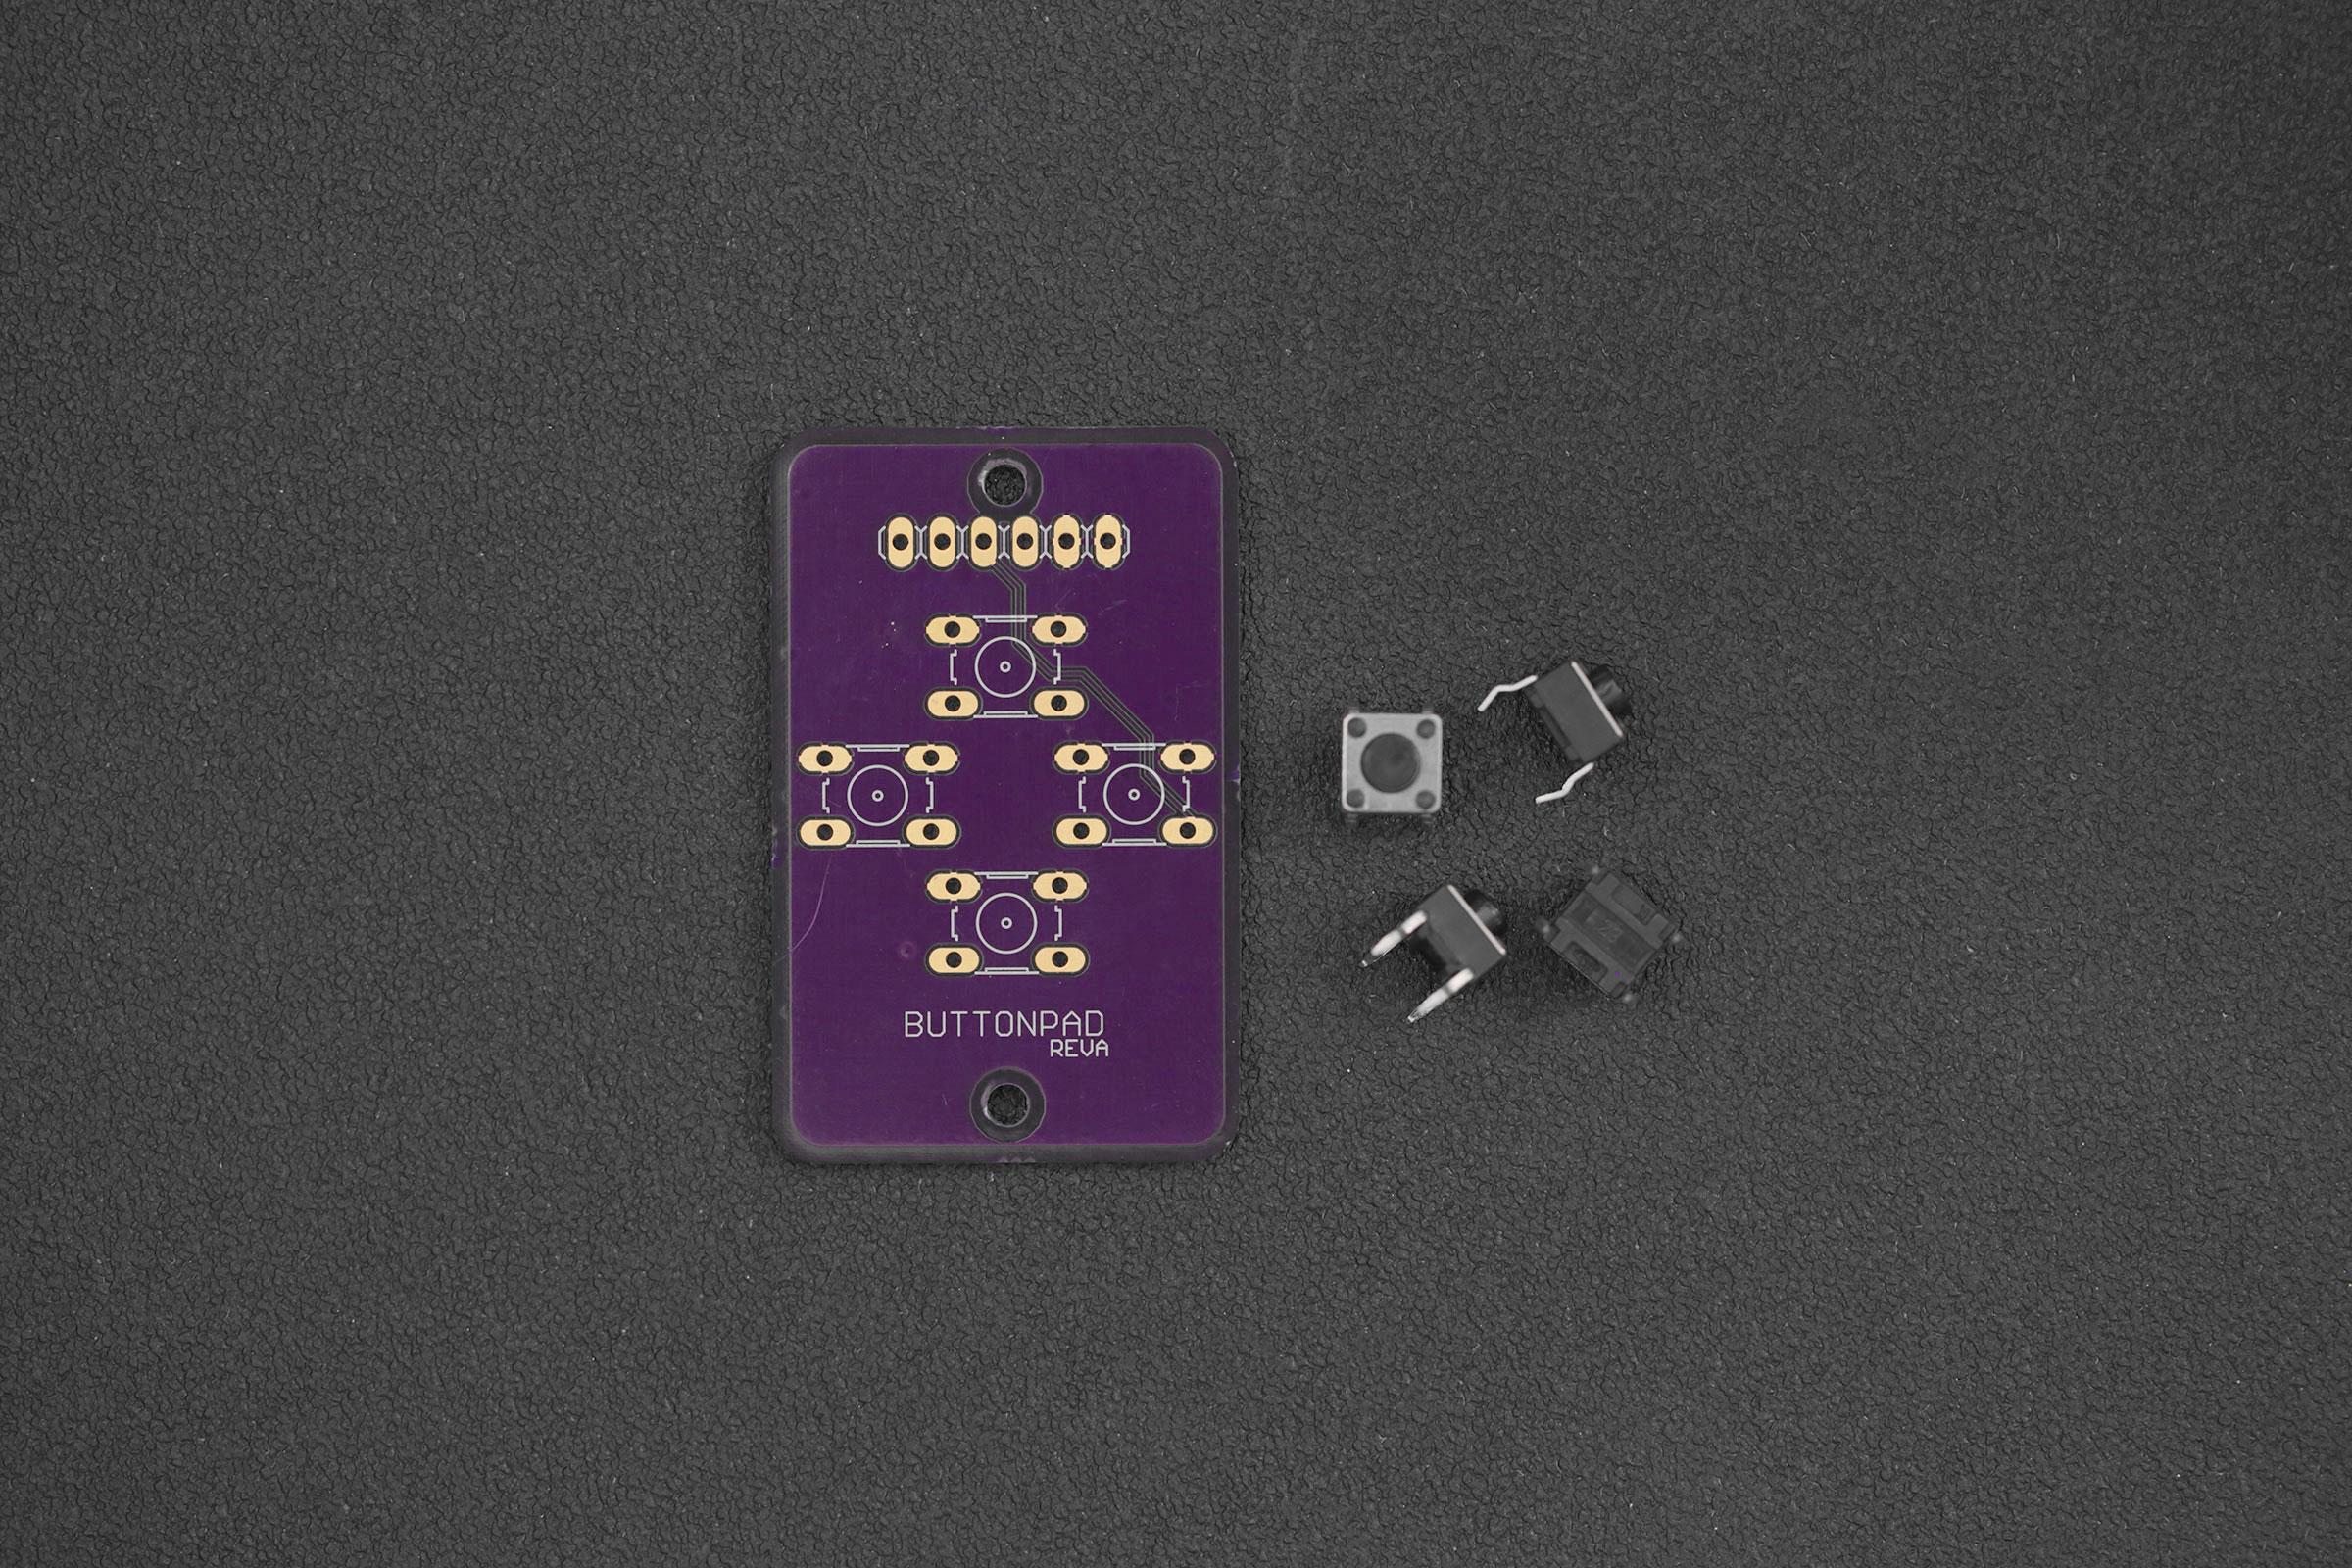 raspberry_pi_gamepad-buttons.jpg